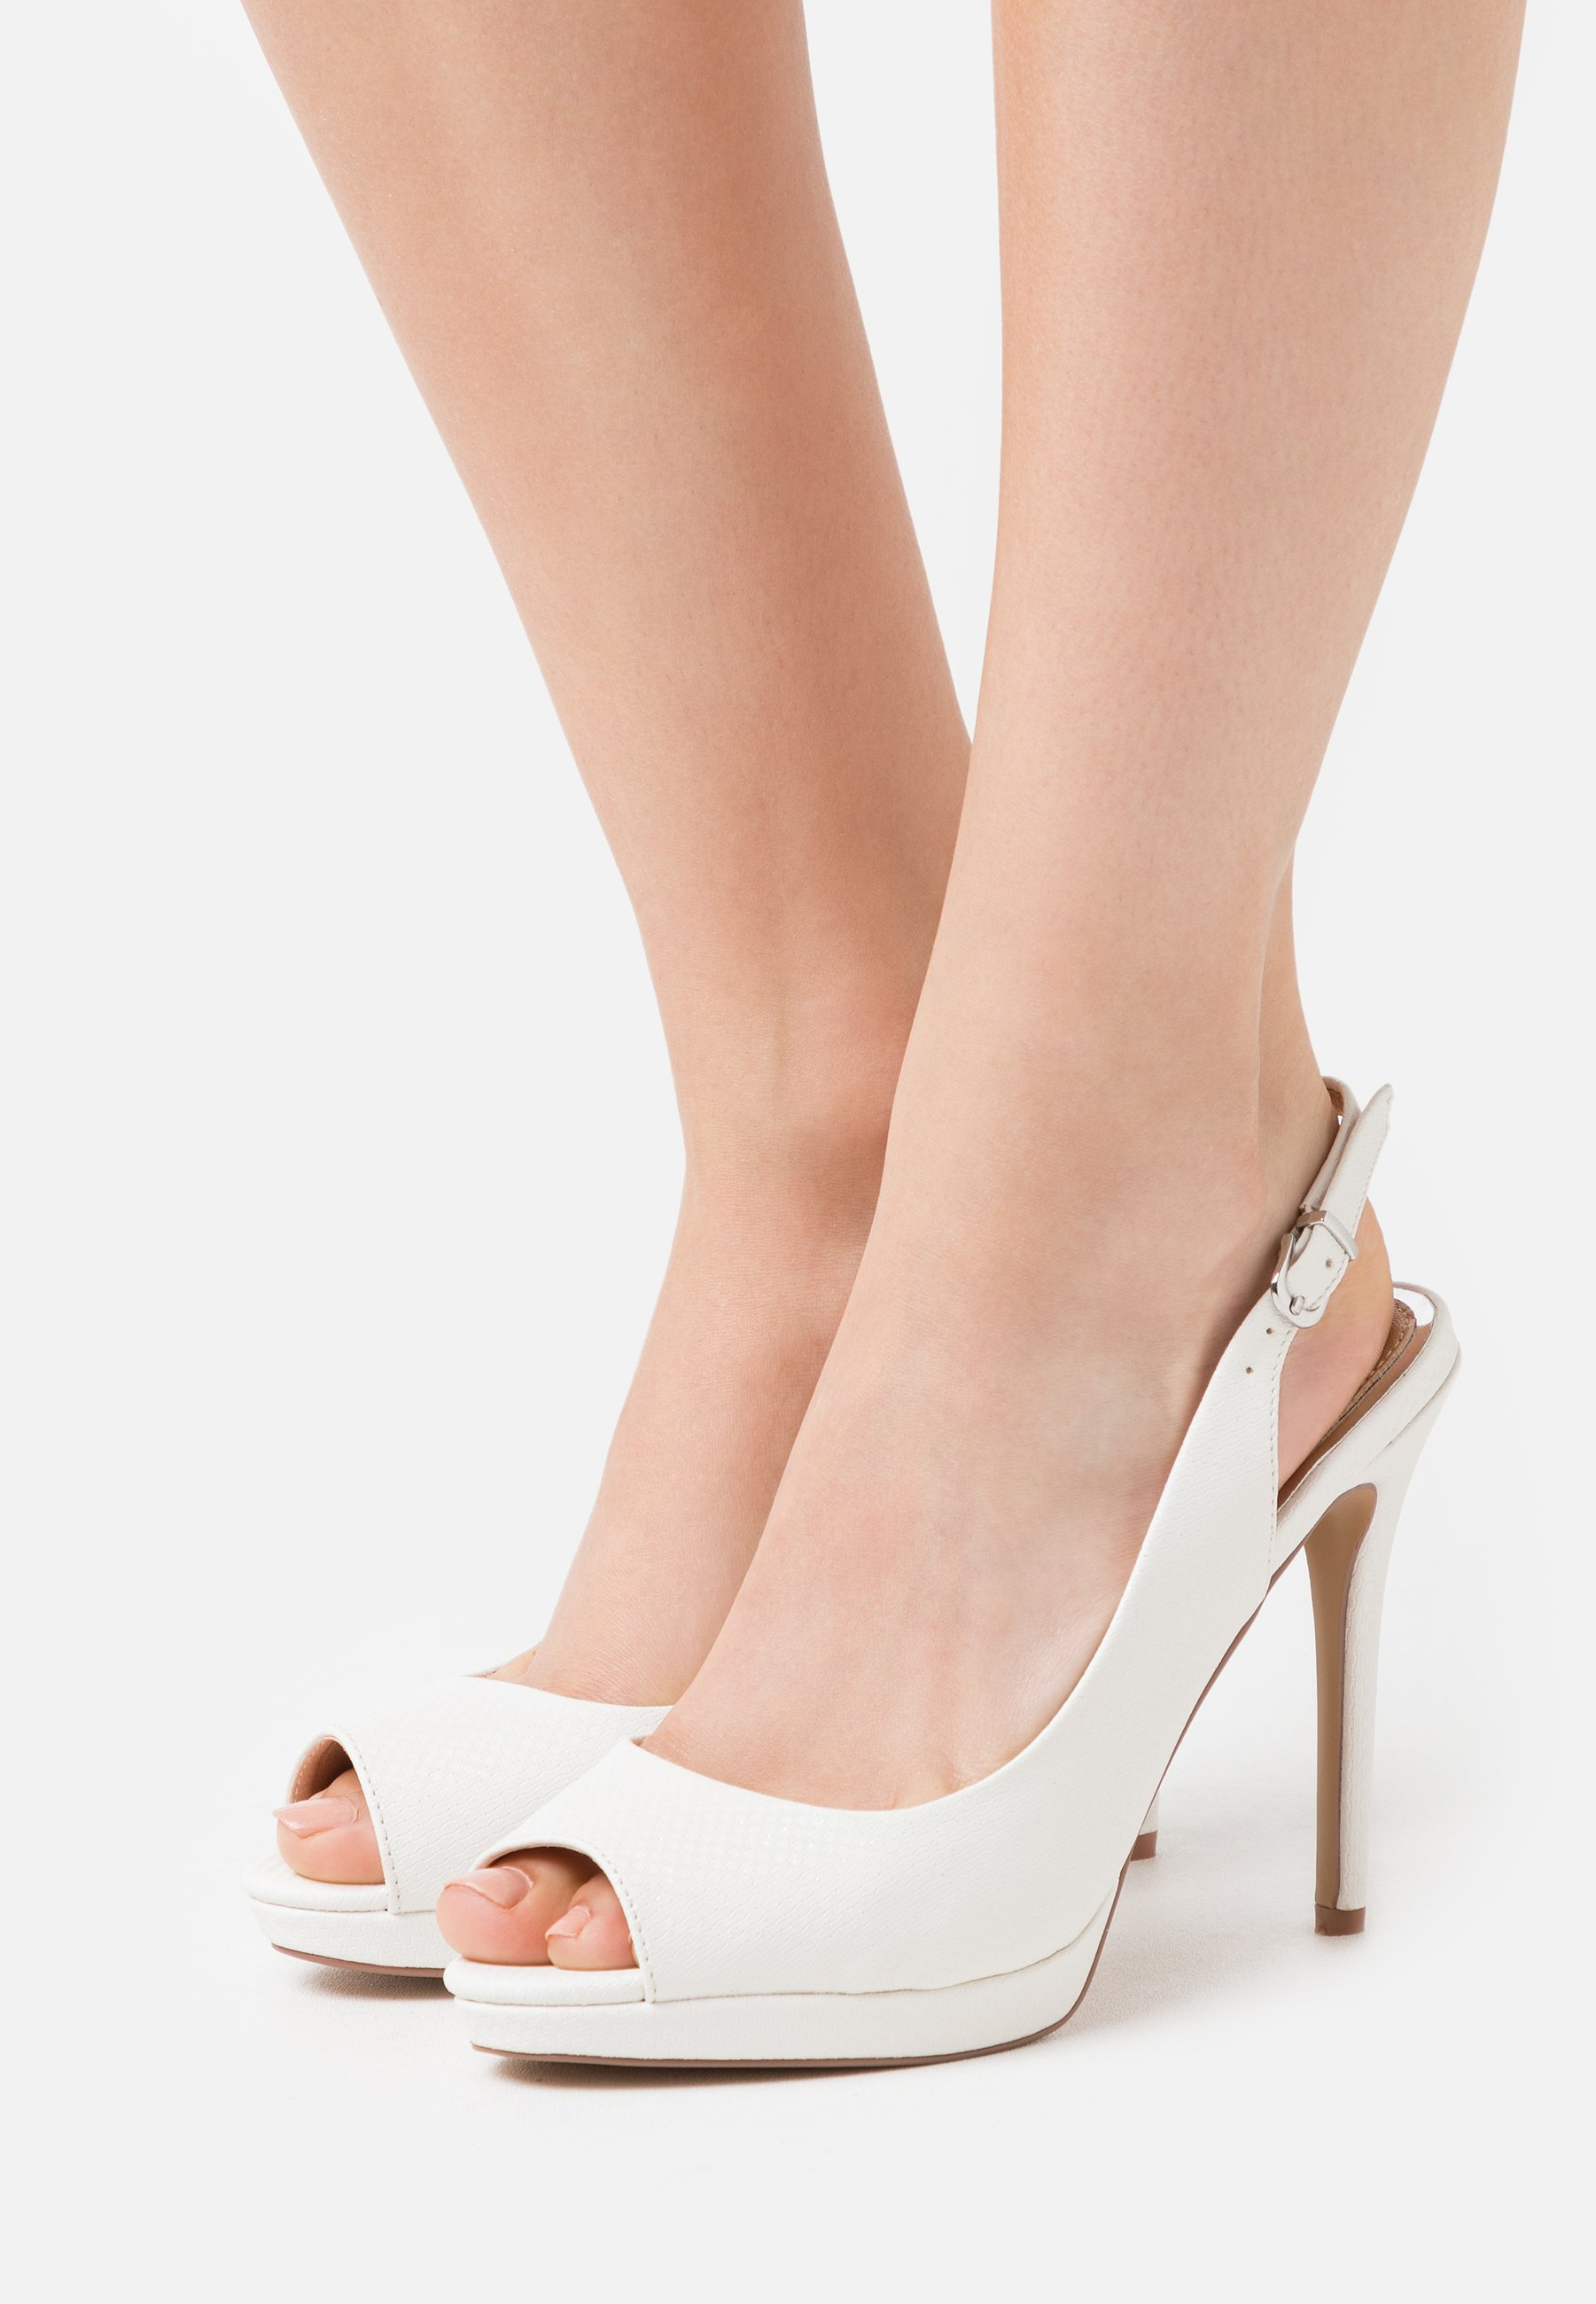 Lulipa London DALLAS - Peeptoes - white - Damesschoenen 2020 Nieuw